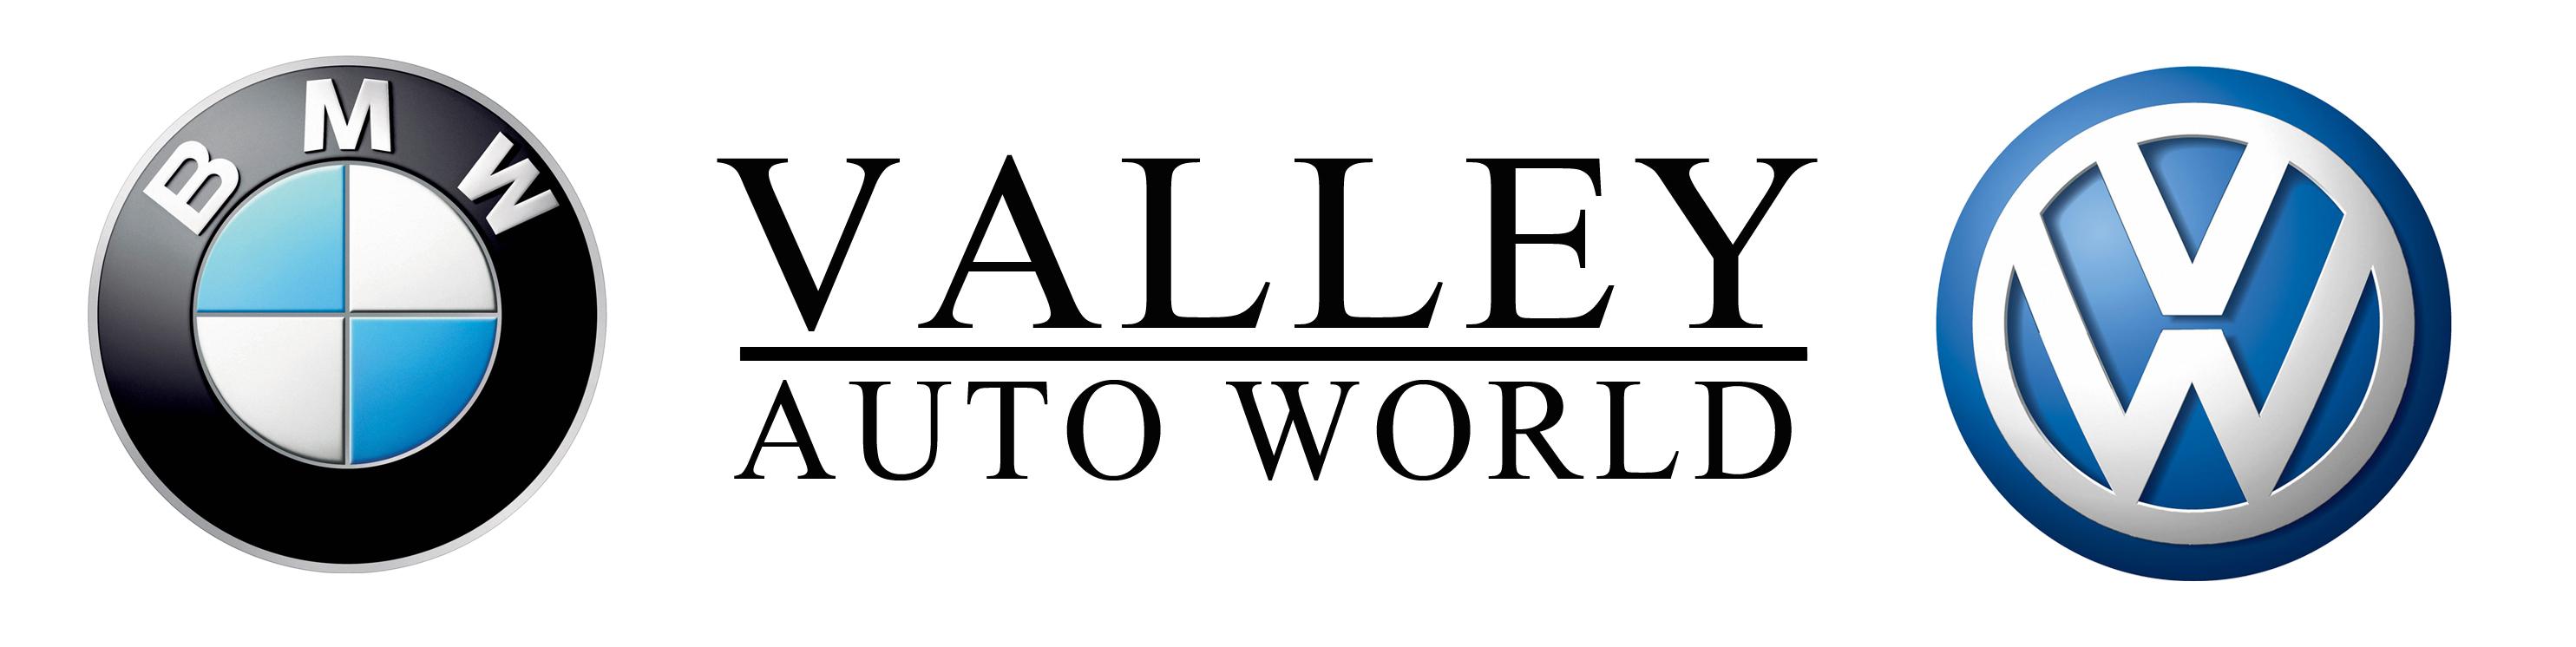 Valley Auto World